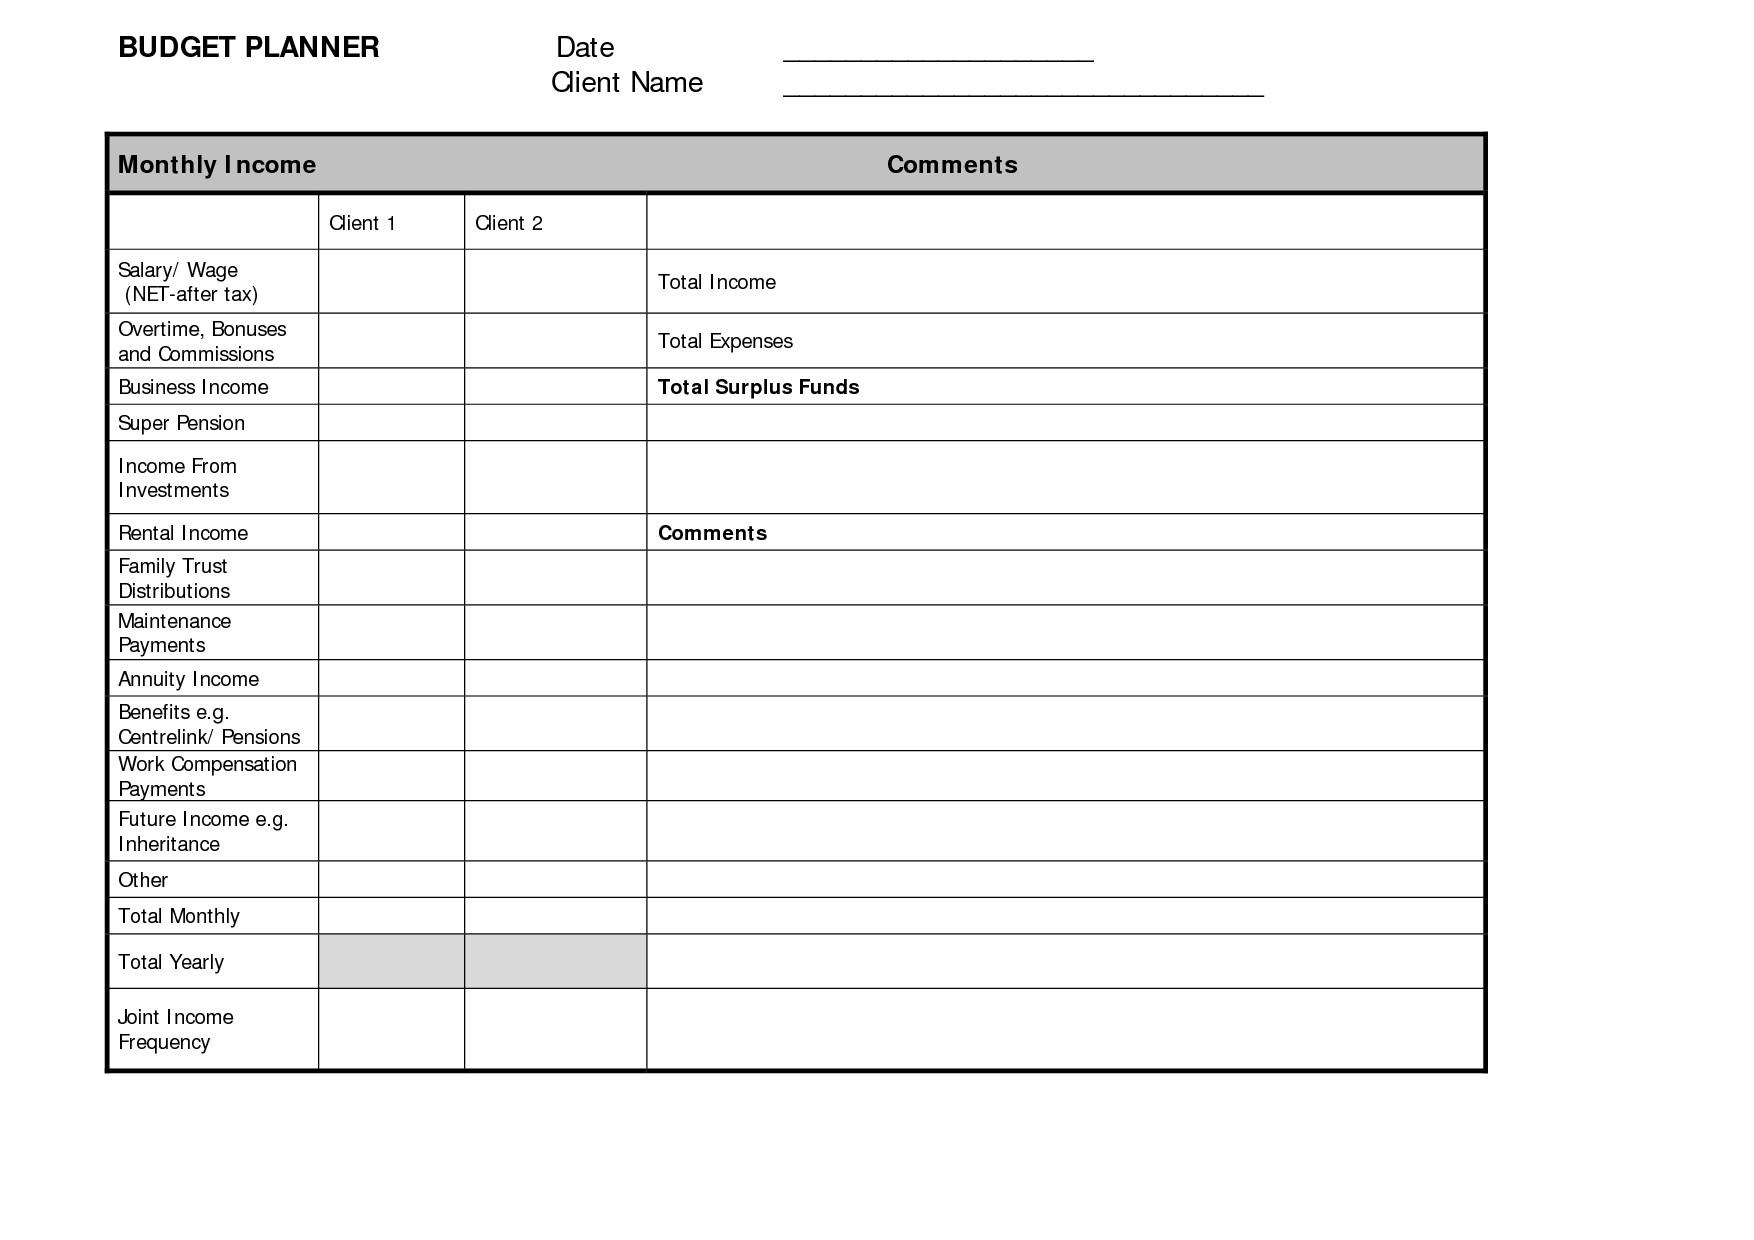 Online Budget Spreadsheet For Free Online Budget Spreadsheet Resourcesaver Org Planner  Parttime Jobs